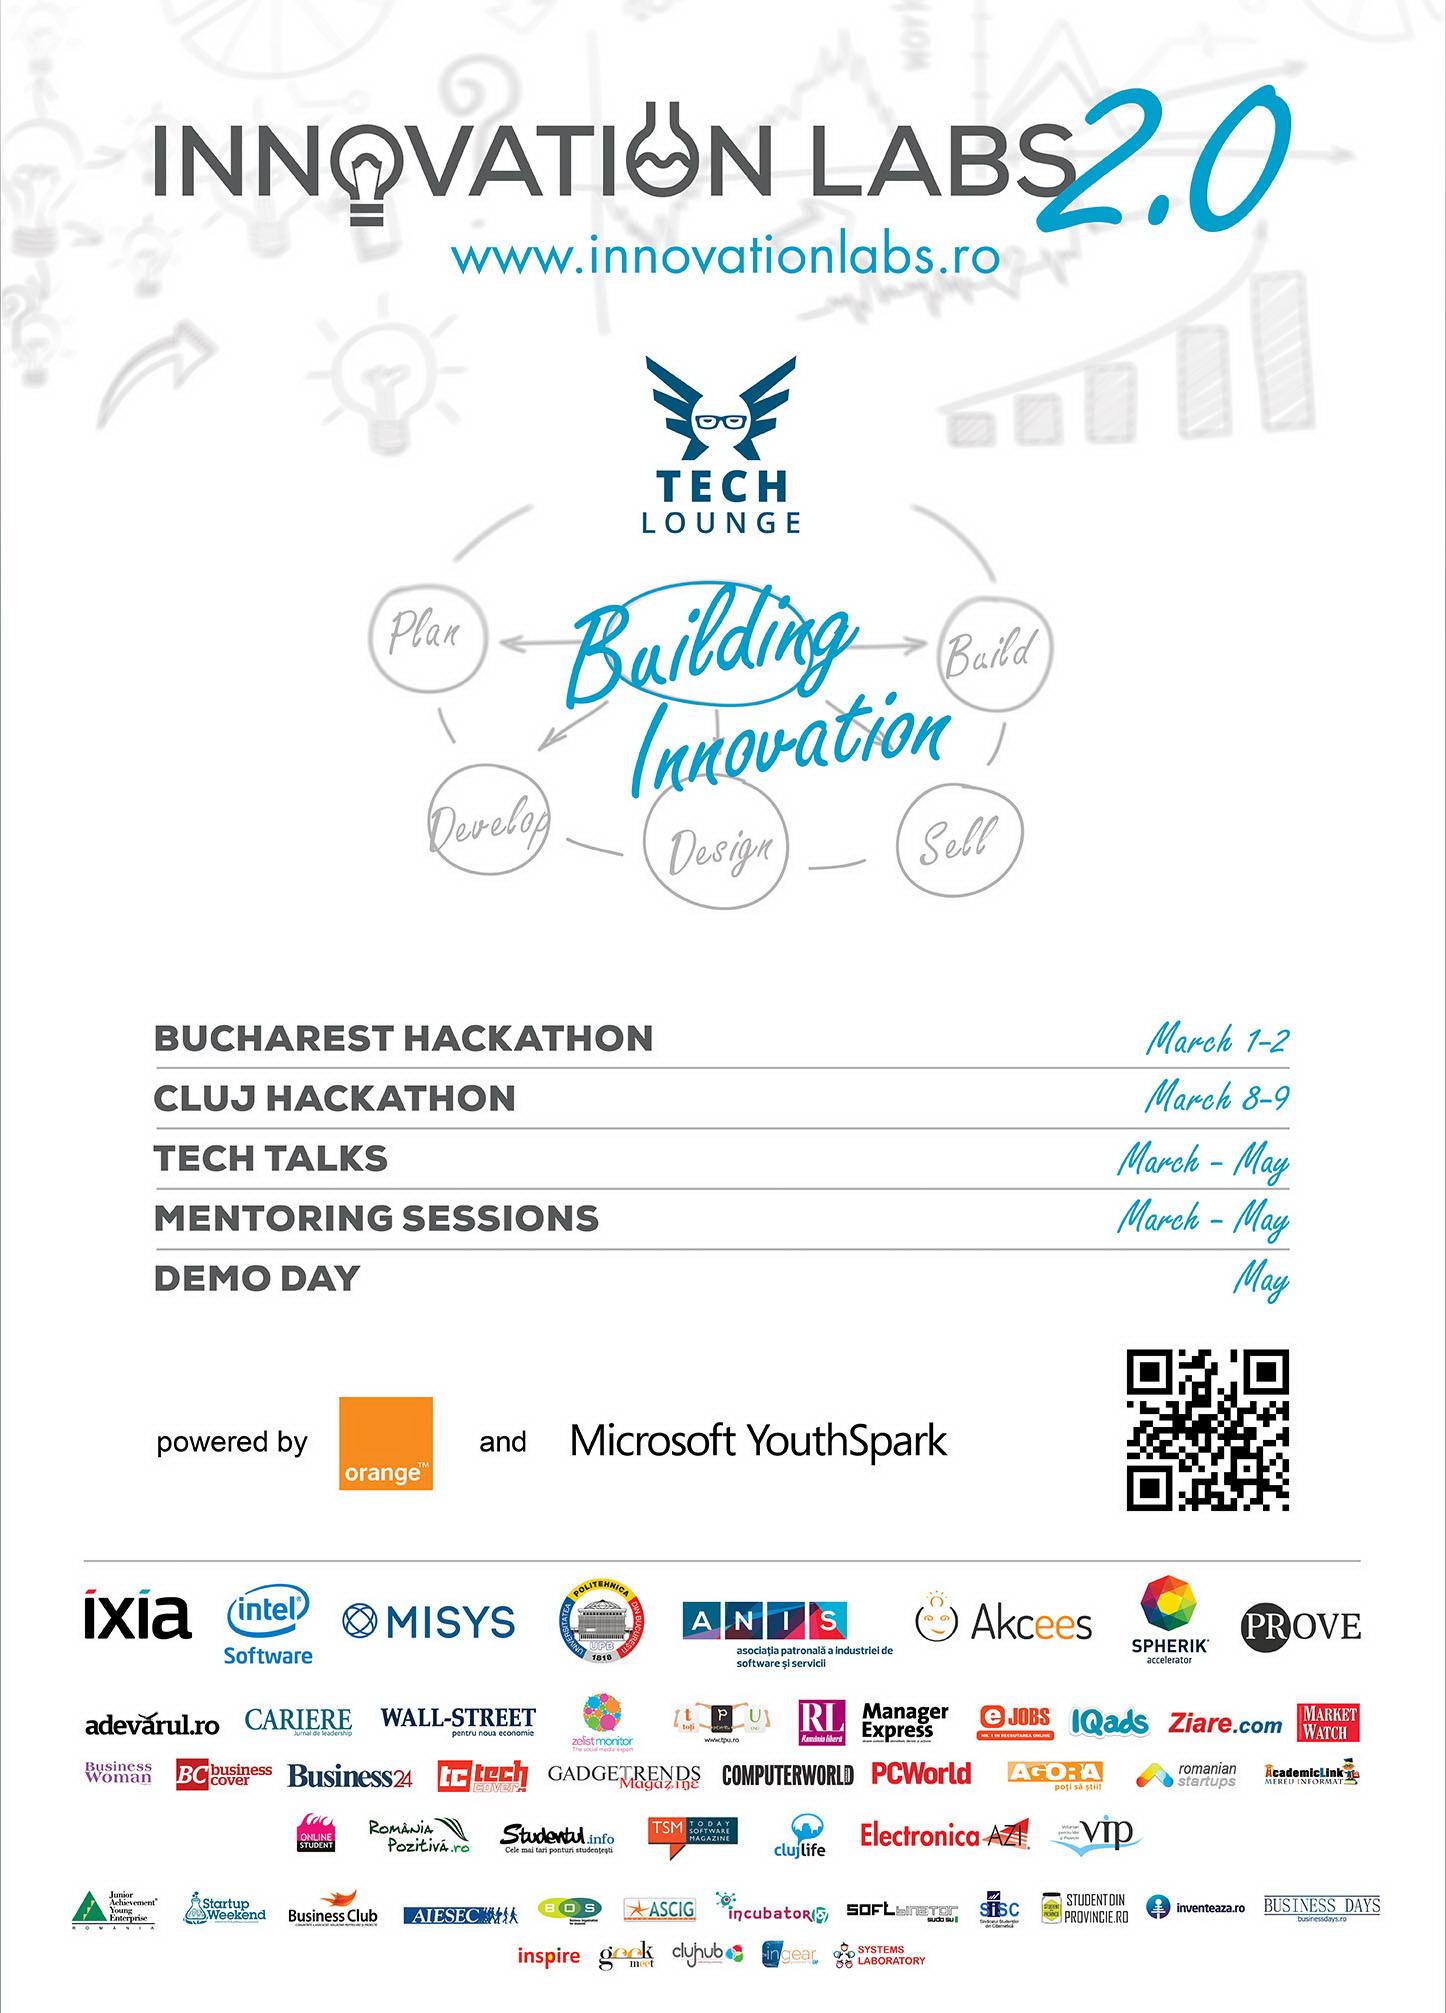 Innovation Labs 2.0. Peste 150 de tineri isi vor prezenta ideile de afaceri la hackathon-ul de la Universitatea Politehnica